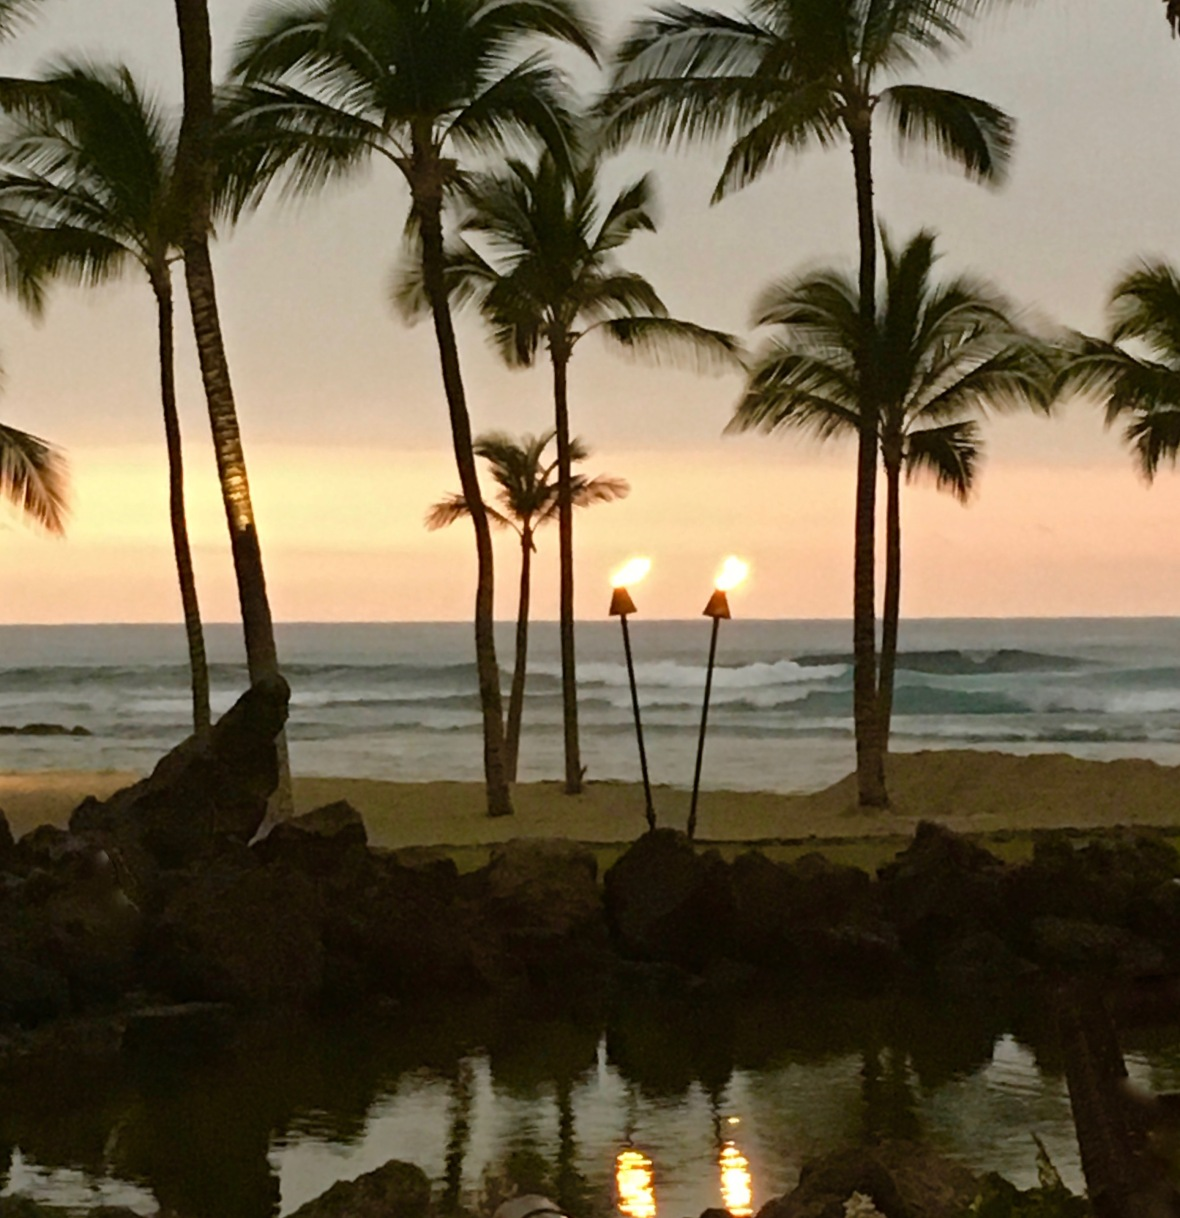 hawaii-2-torches-beach-reflection-pond